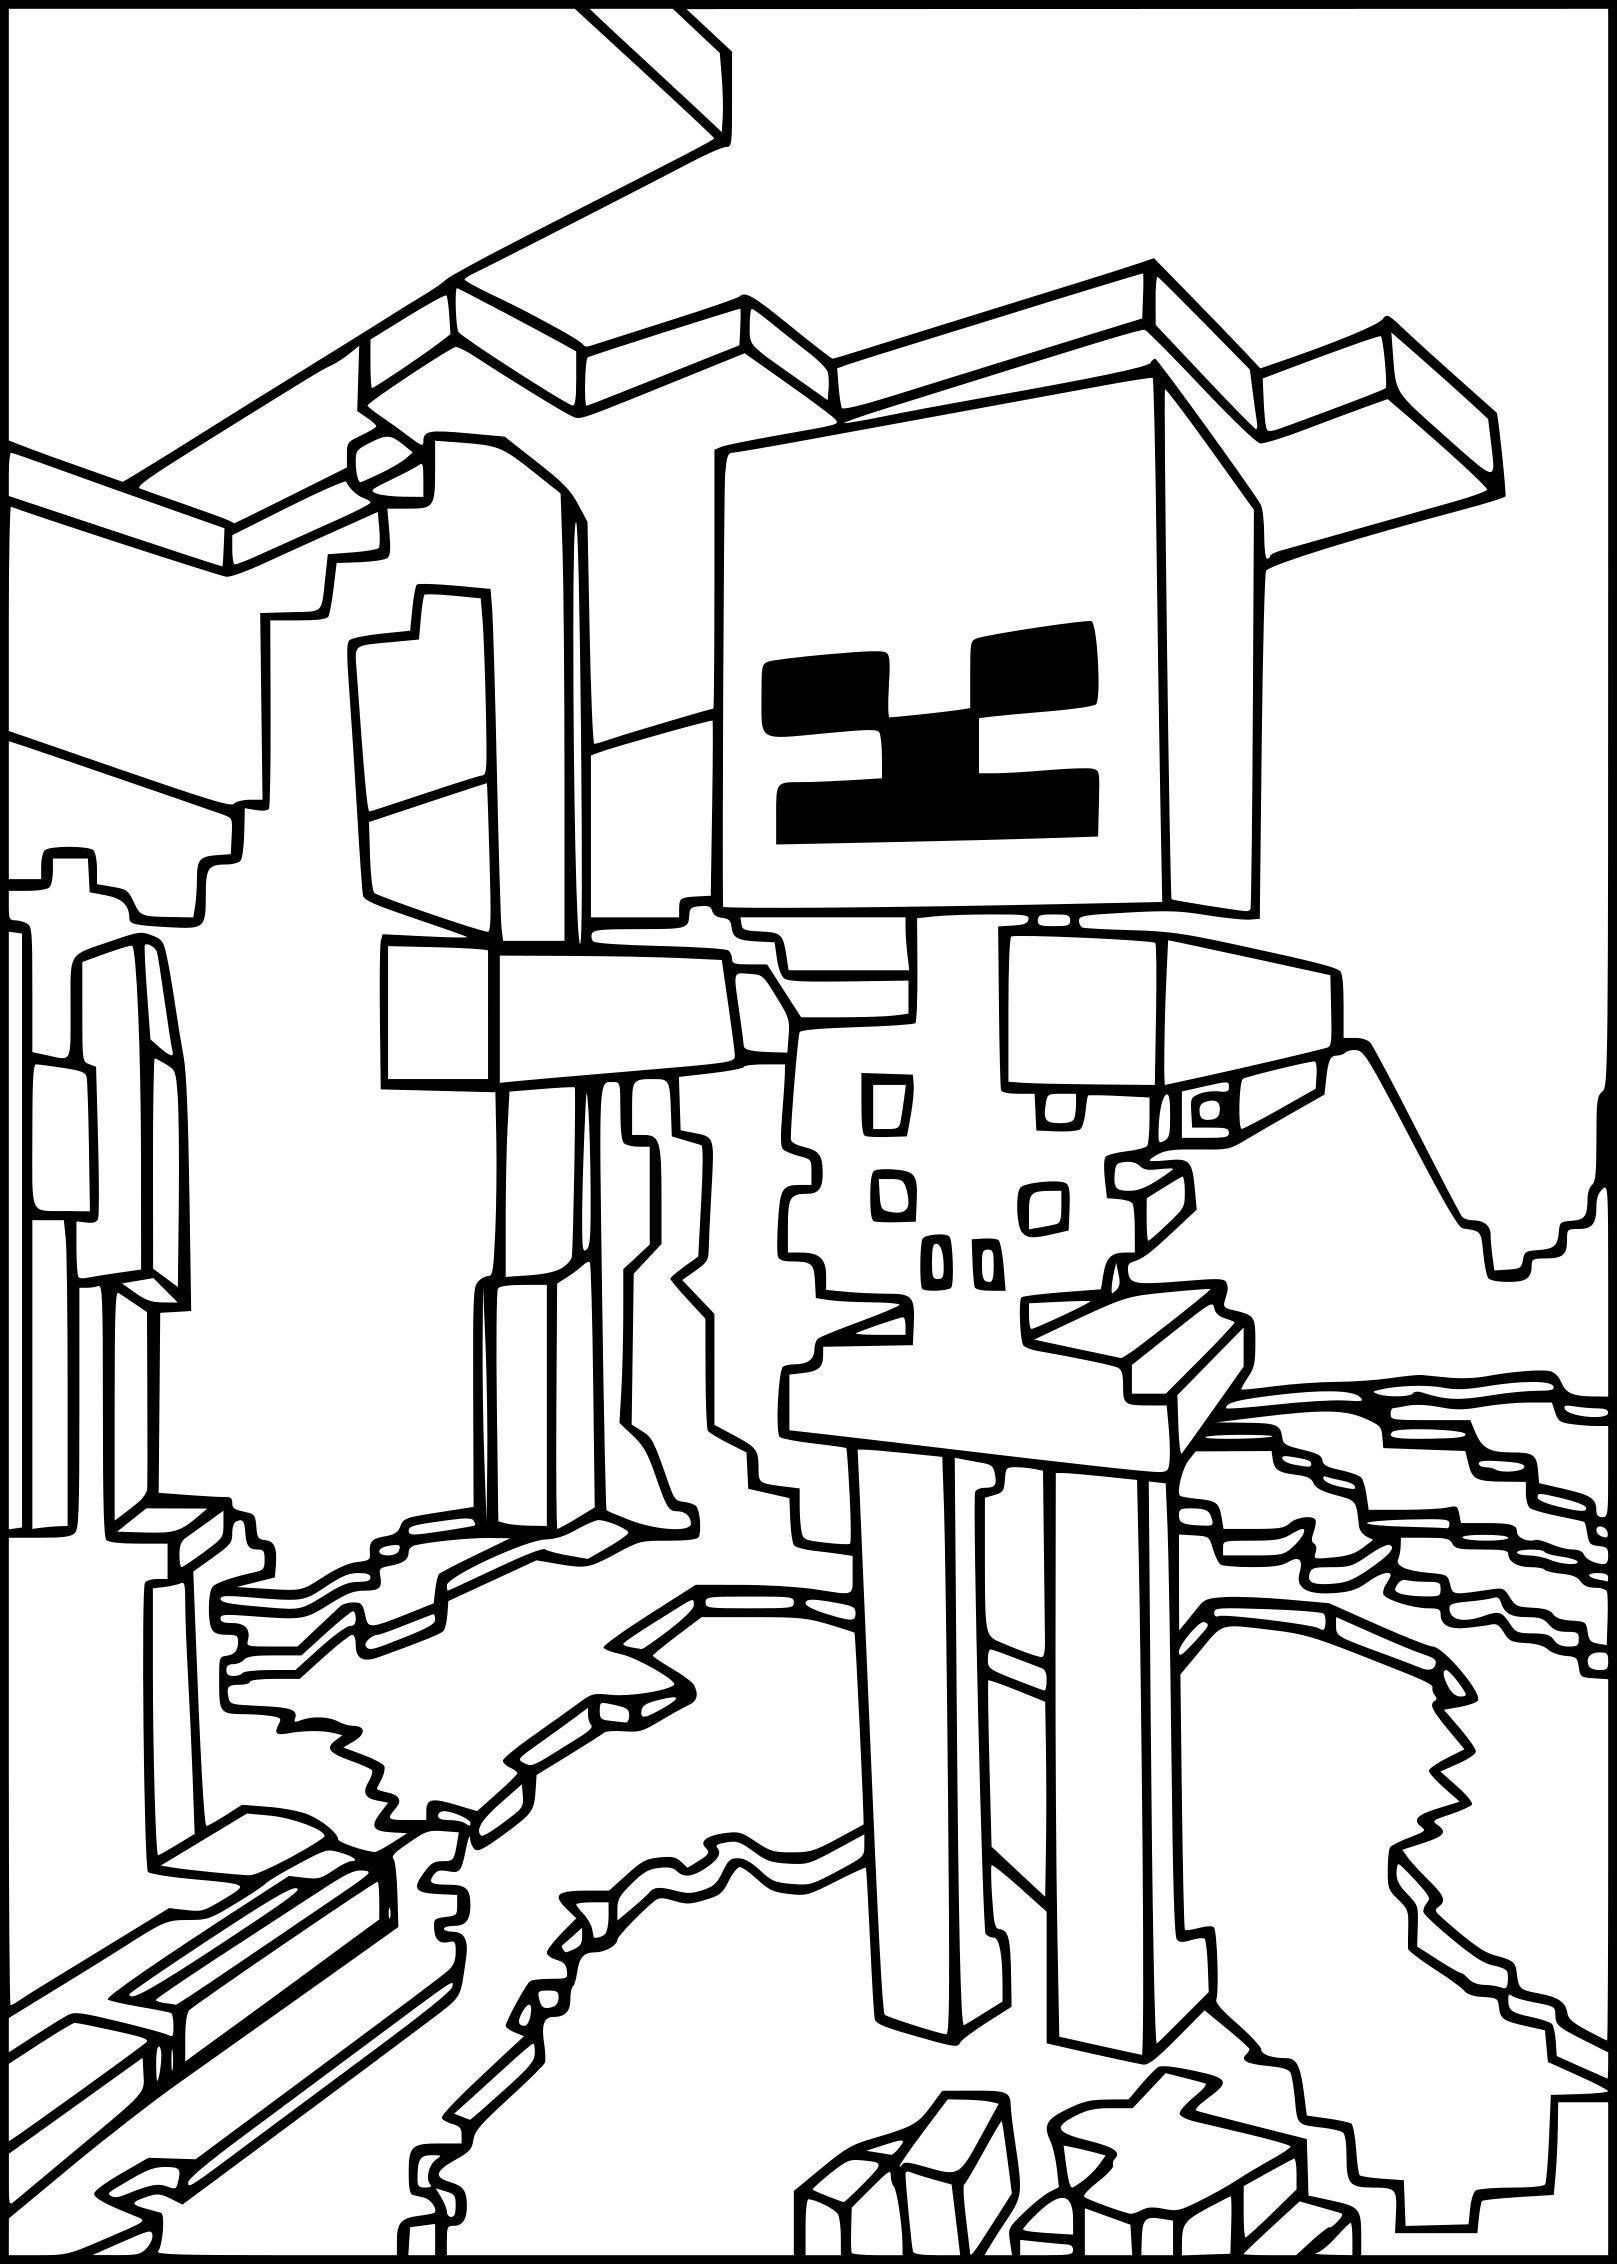 Dessin De Minecraft A Colorier Inspirant Plan Coloriage Squelette Minecraft Imprimer Of Dessin De Minecraft A Colorier Jpg 1617 2264